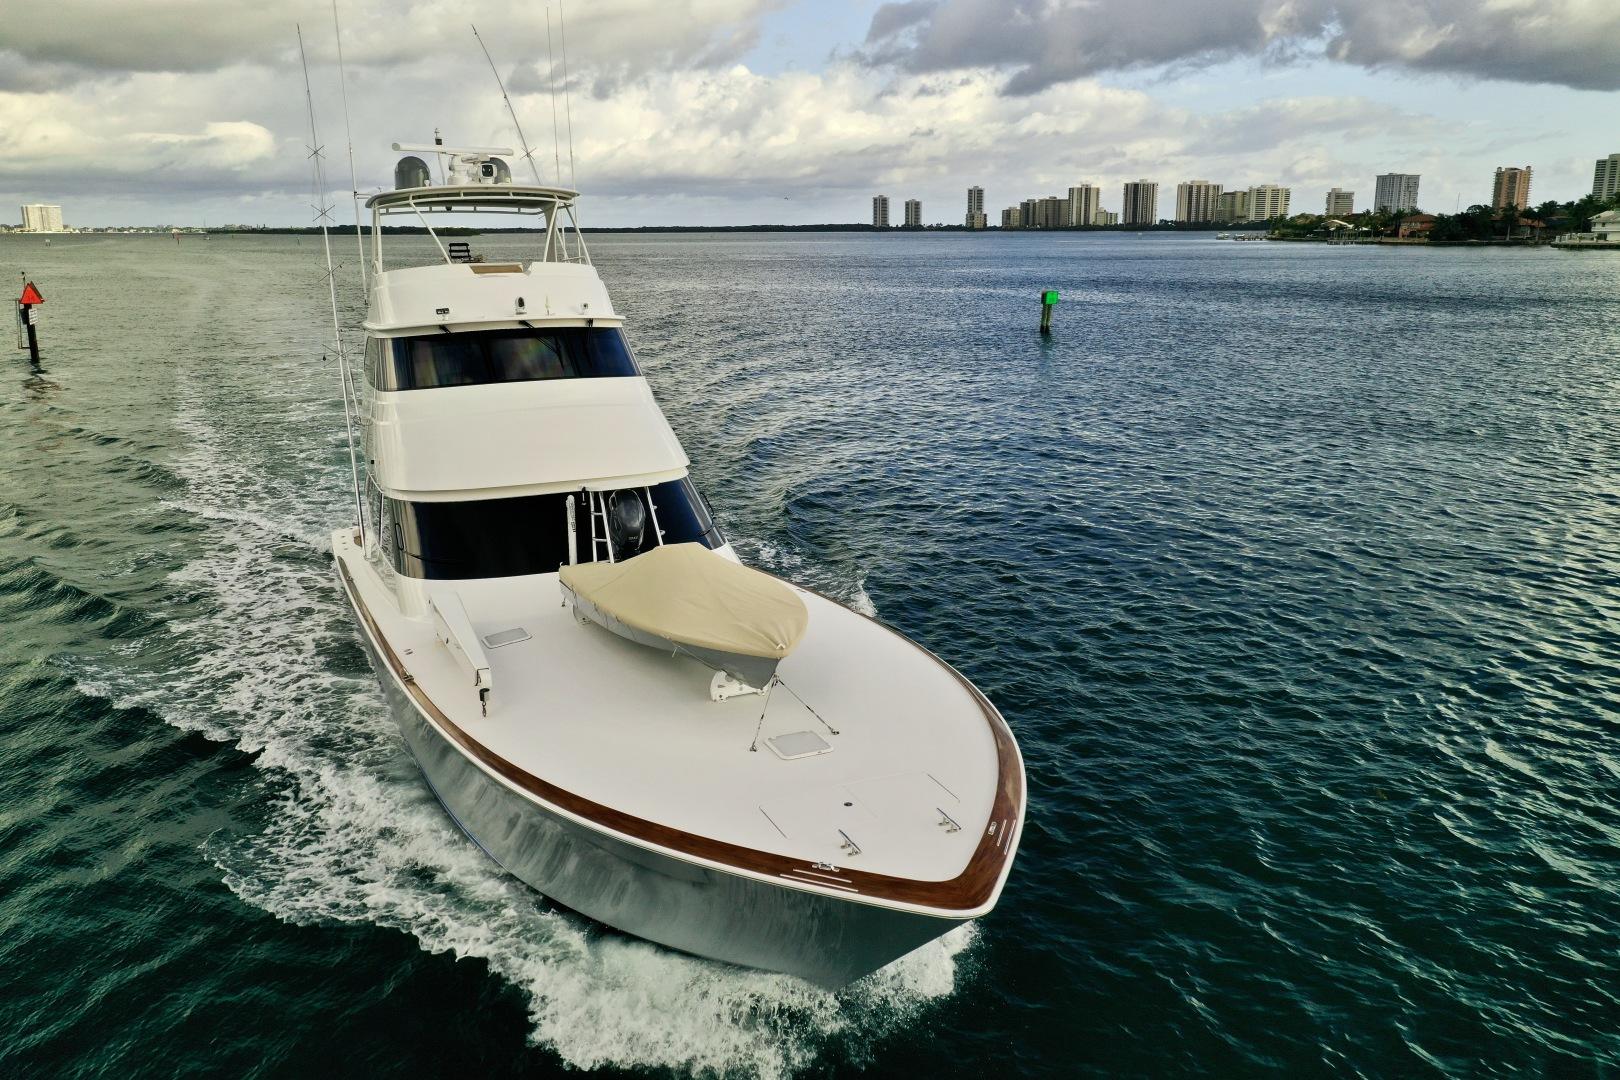 Viking-76 Convertible 2010-High Cotton Palm Beach-Florida-United States-2010 76 Viking Convertible   Bow (4)-1317932 | Thumbnail